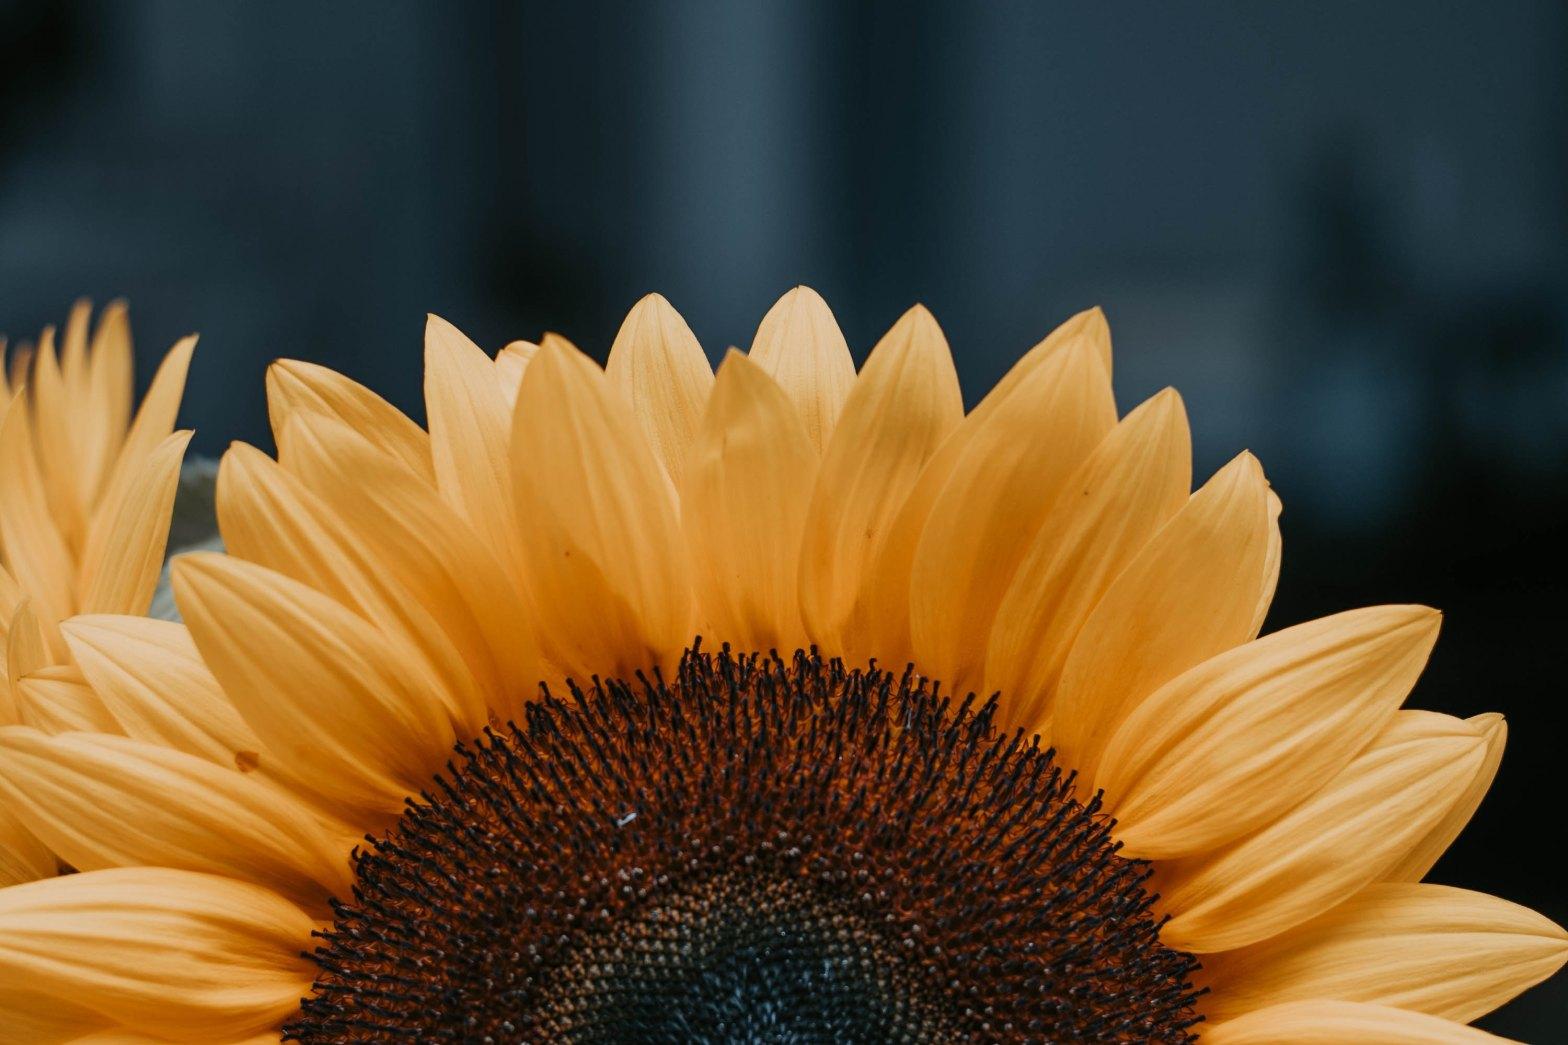 a piture of half a sunflower Photo by Juliana Araujo on Unsplash